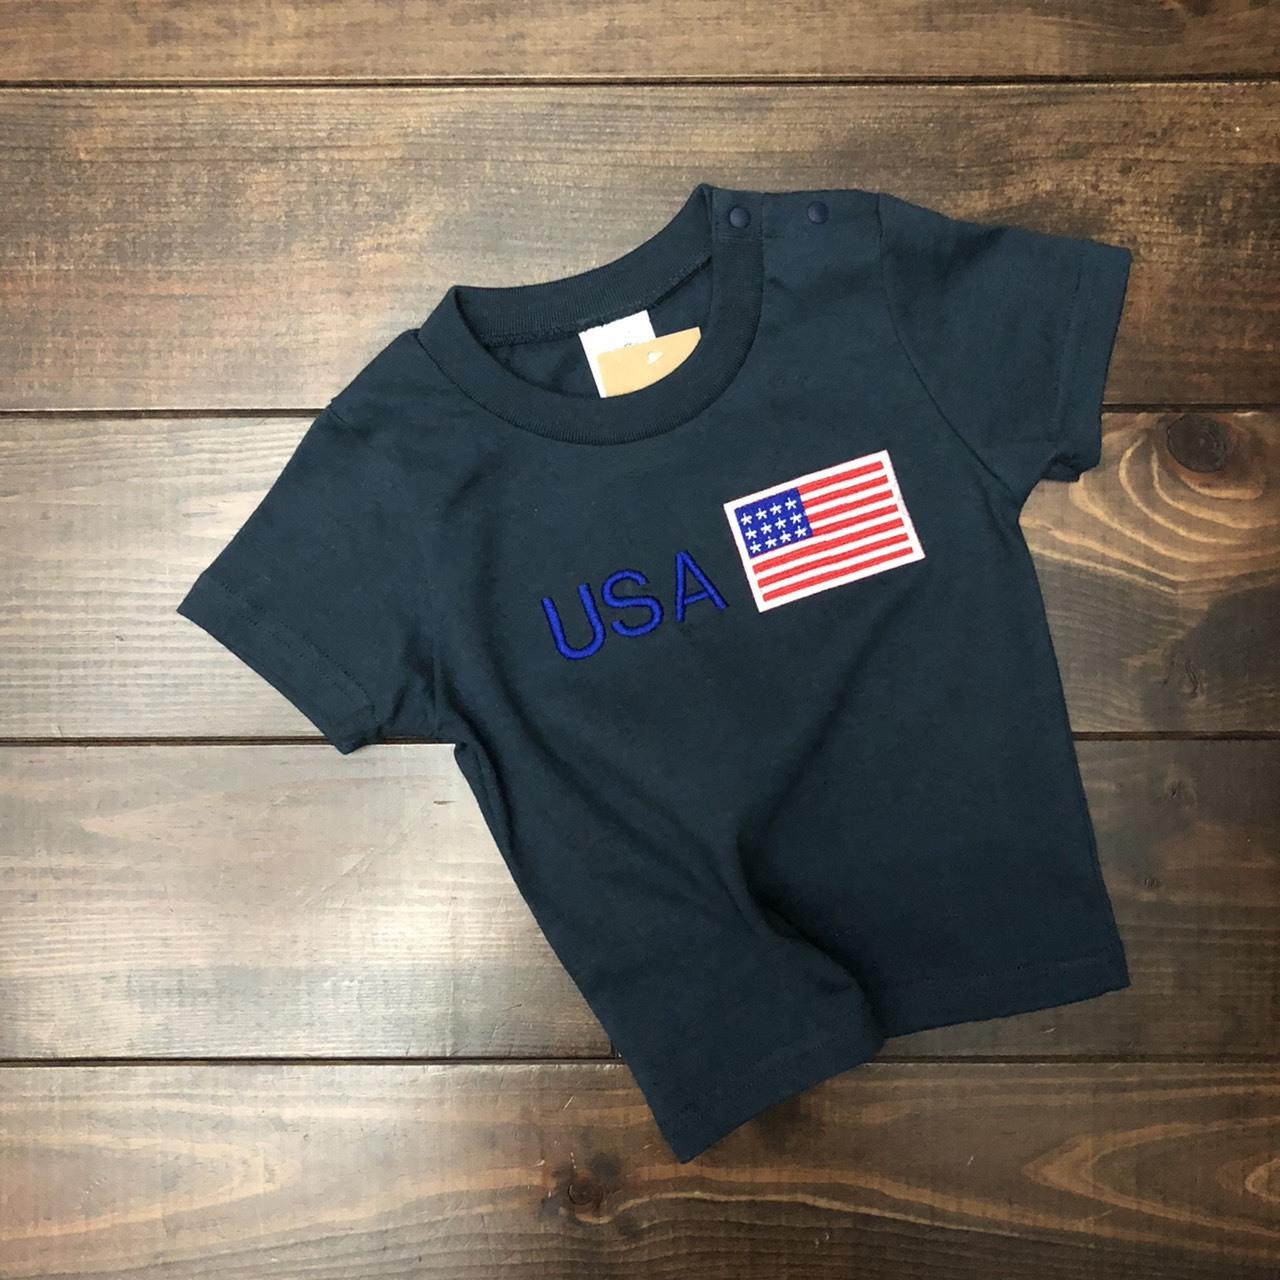 USA flag Tee アメリカ国旗 for KIDS 90サイズ